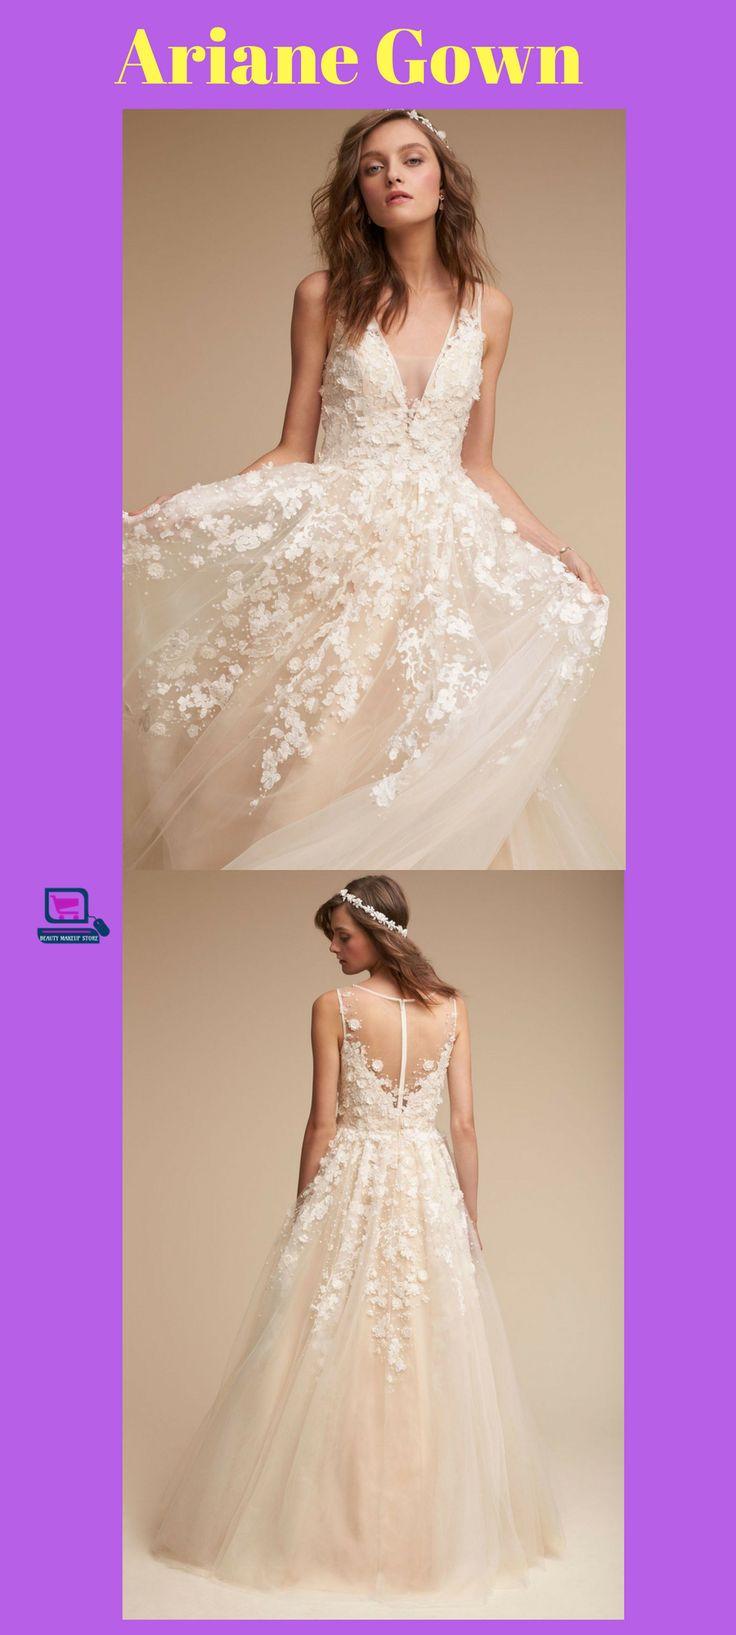 Ariane gown #weddingdress #weddingdressinspiration #weddingdresses #weddingressforsale wedding dress for sale | wedding dress for sale lace | wedding dress for sale cheap | wedding dress for sale used | wedding dress for sale vintage | Wedding Dress for Sale |